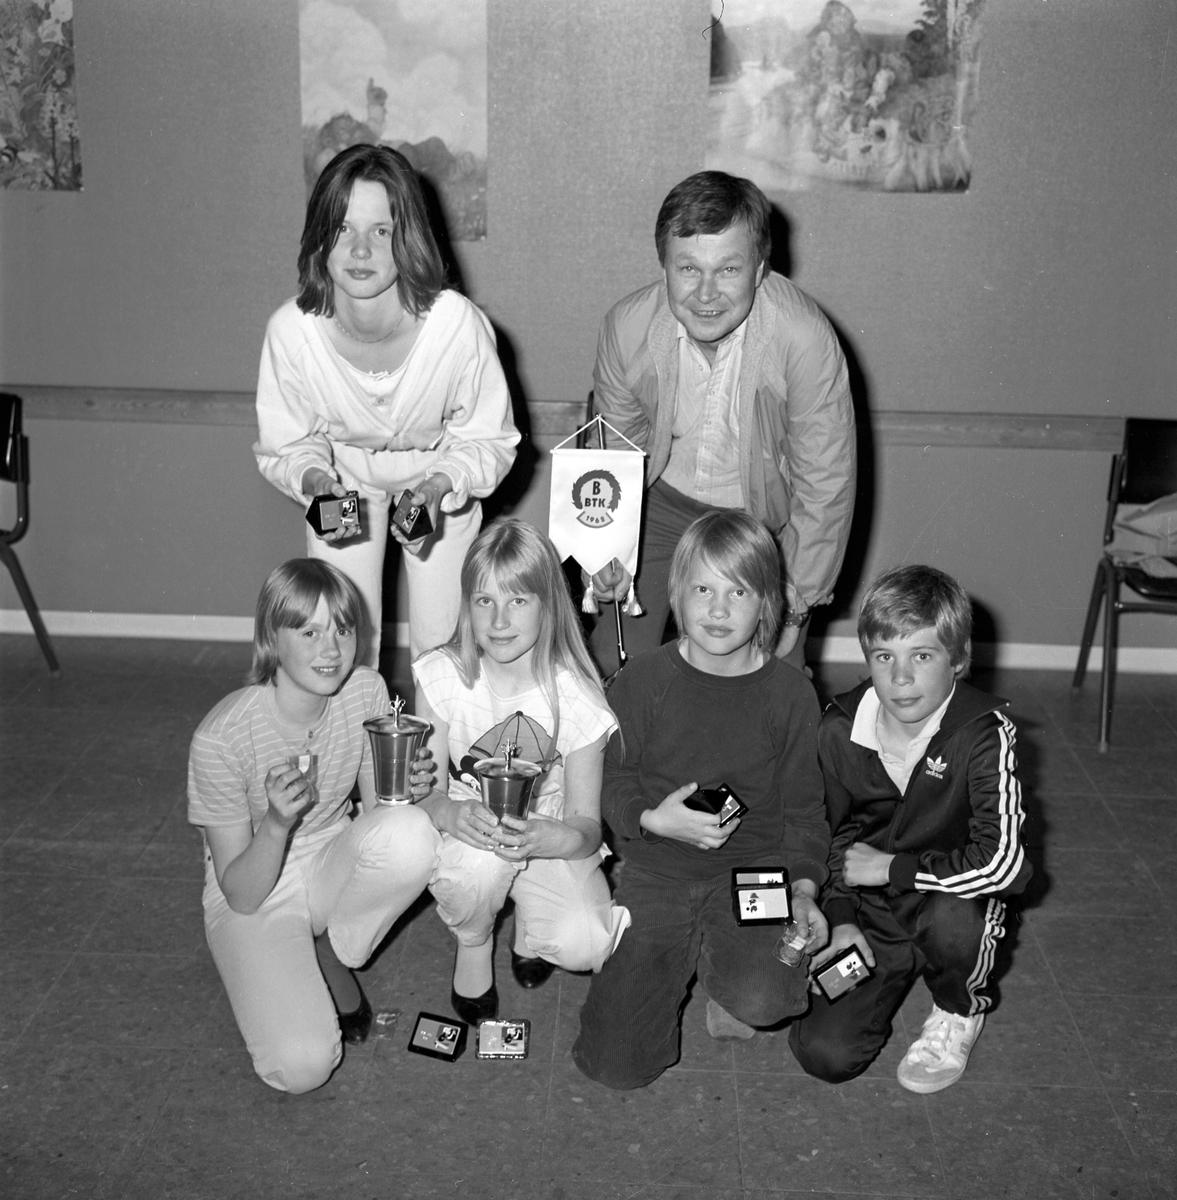 Bomhus BTK avslutning. Maj 1985